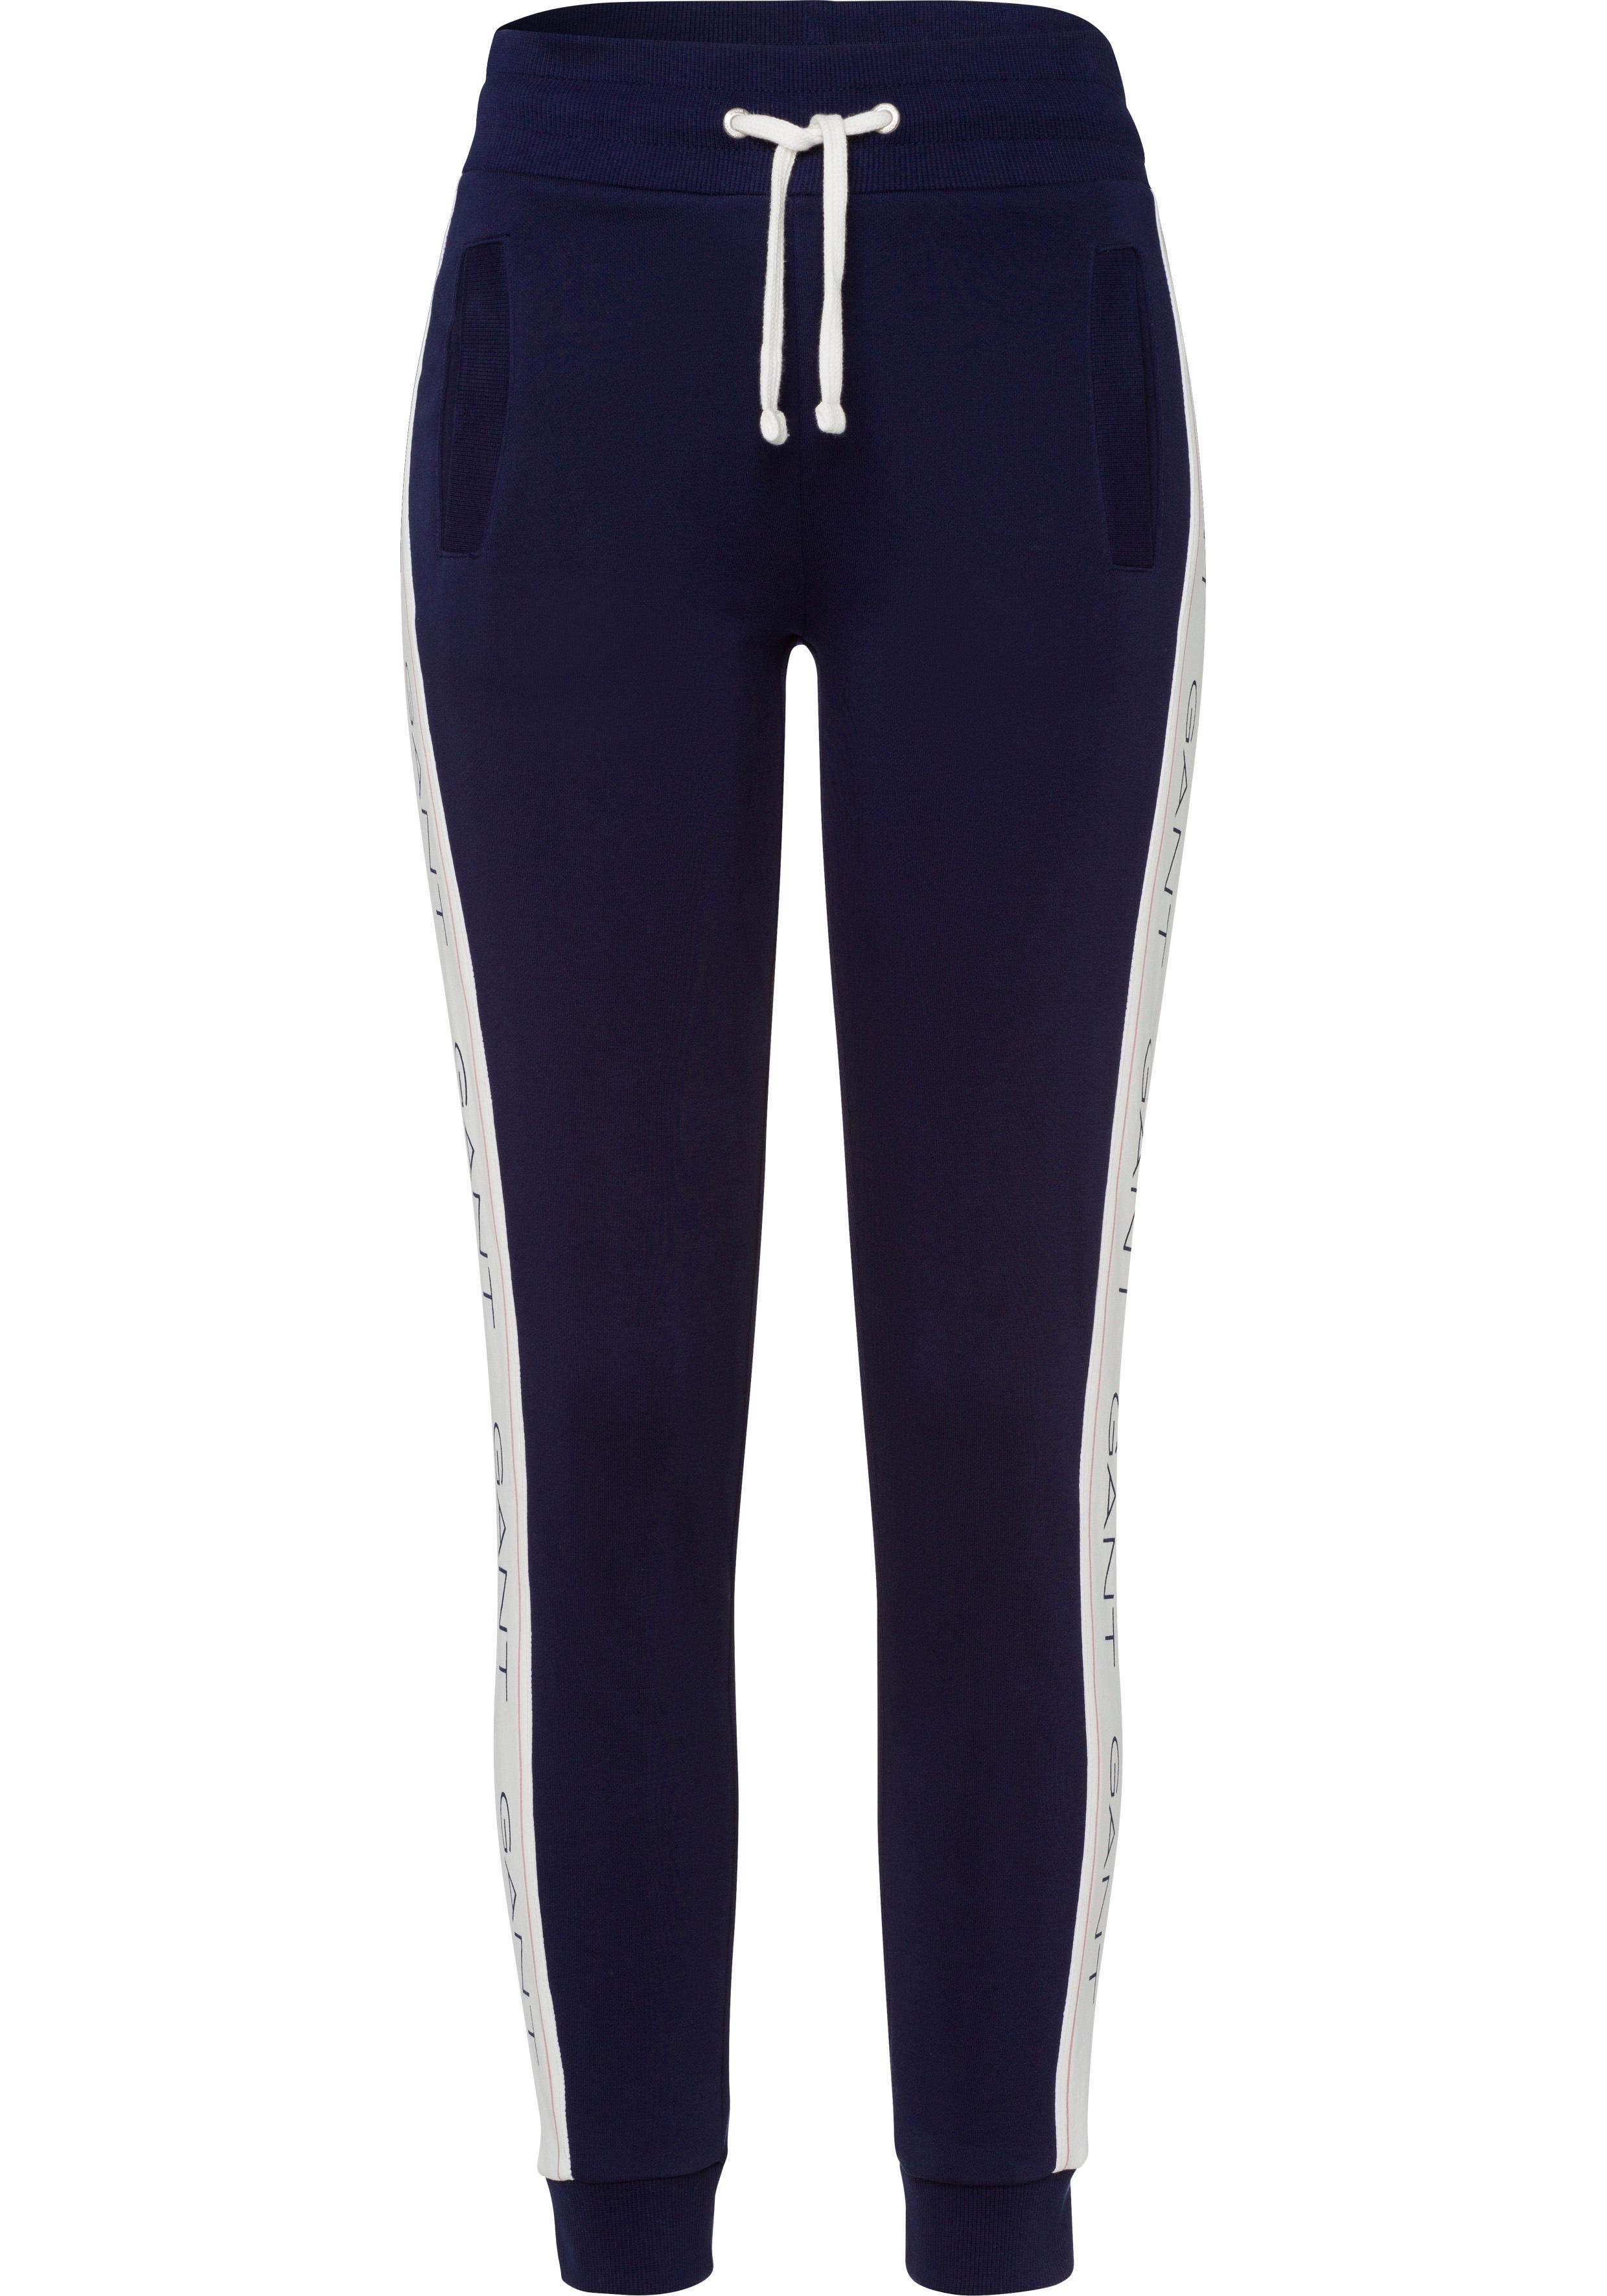 Gant Jogger Pants